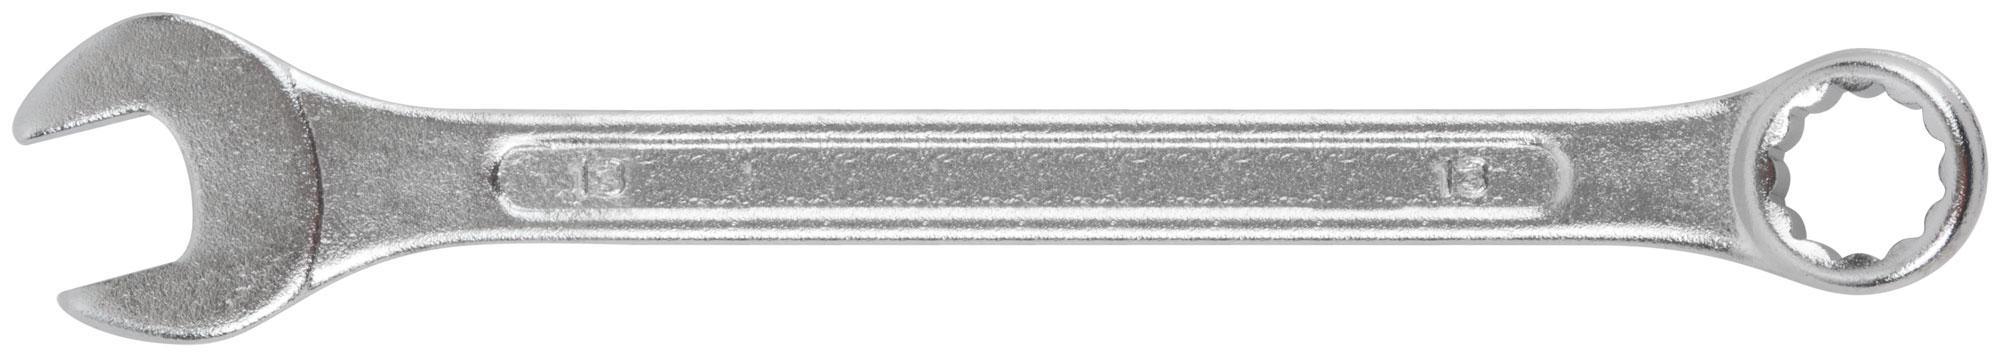 Ключ гаечный комбинированный Fit 63143 (13 мм) ключ комбинированный kraft 14 мм кт 700508